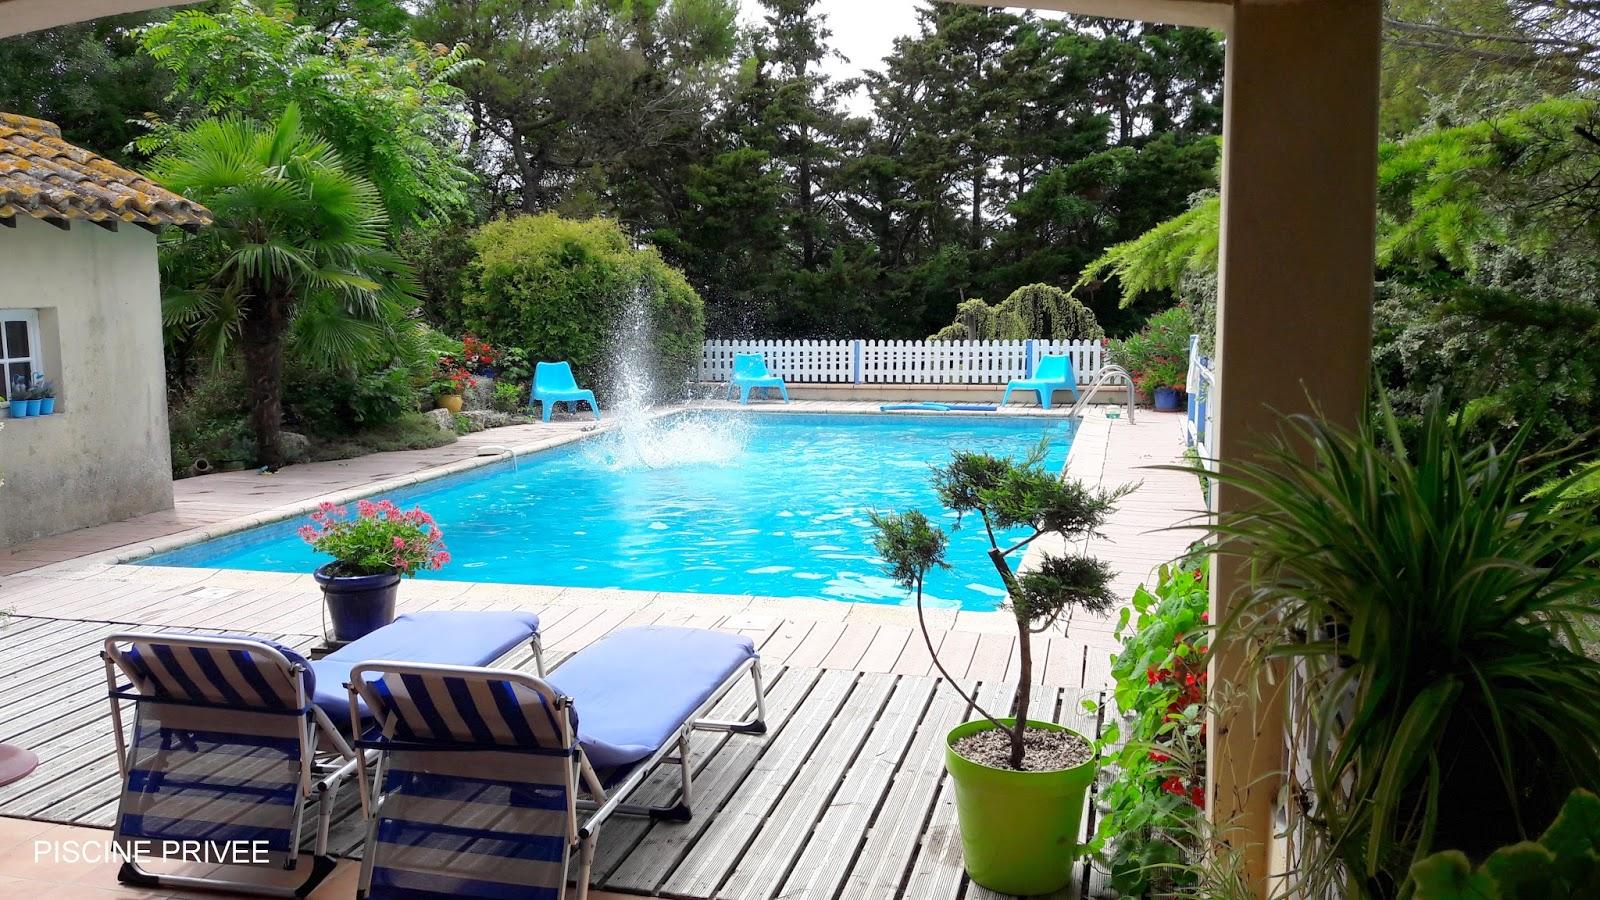 Location en pays cathare description de la location for Location pays cathare avec piscine